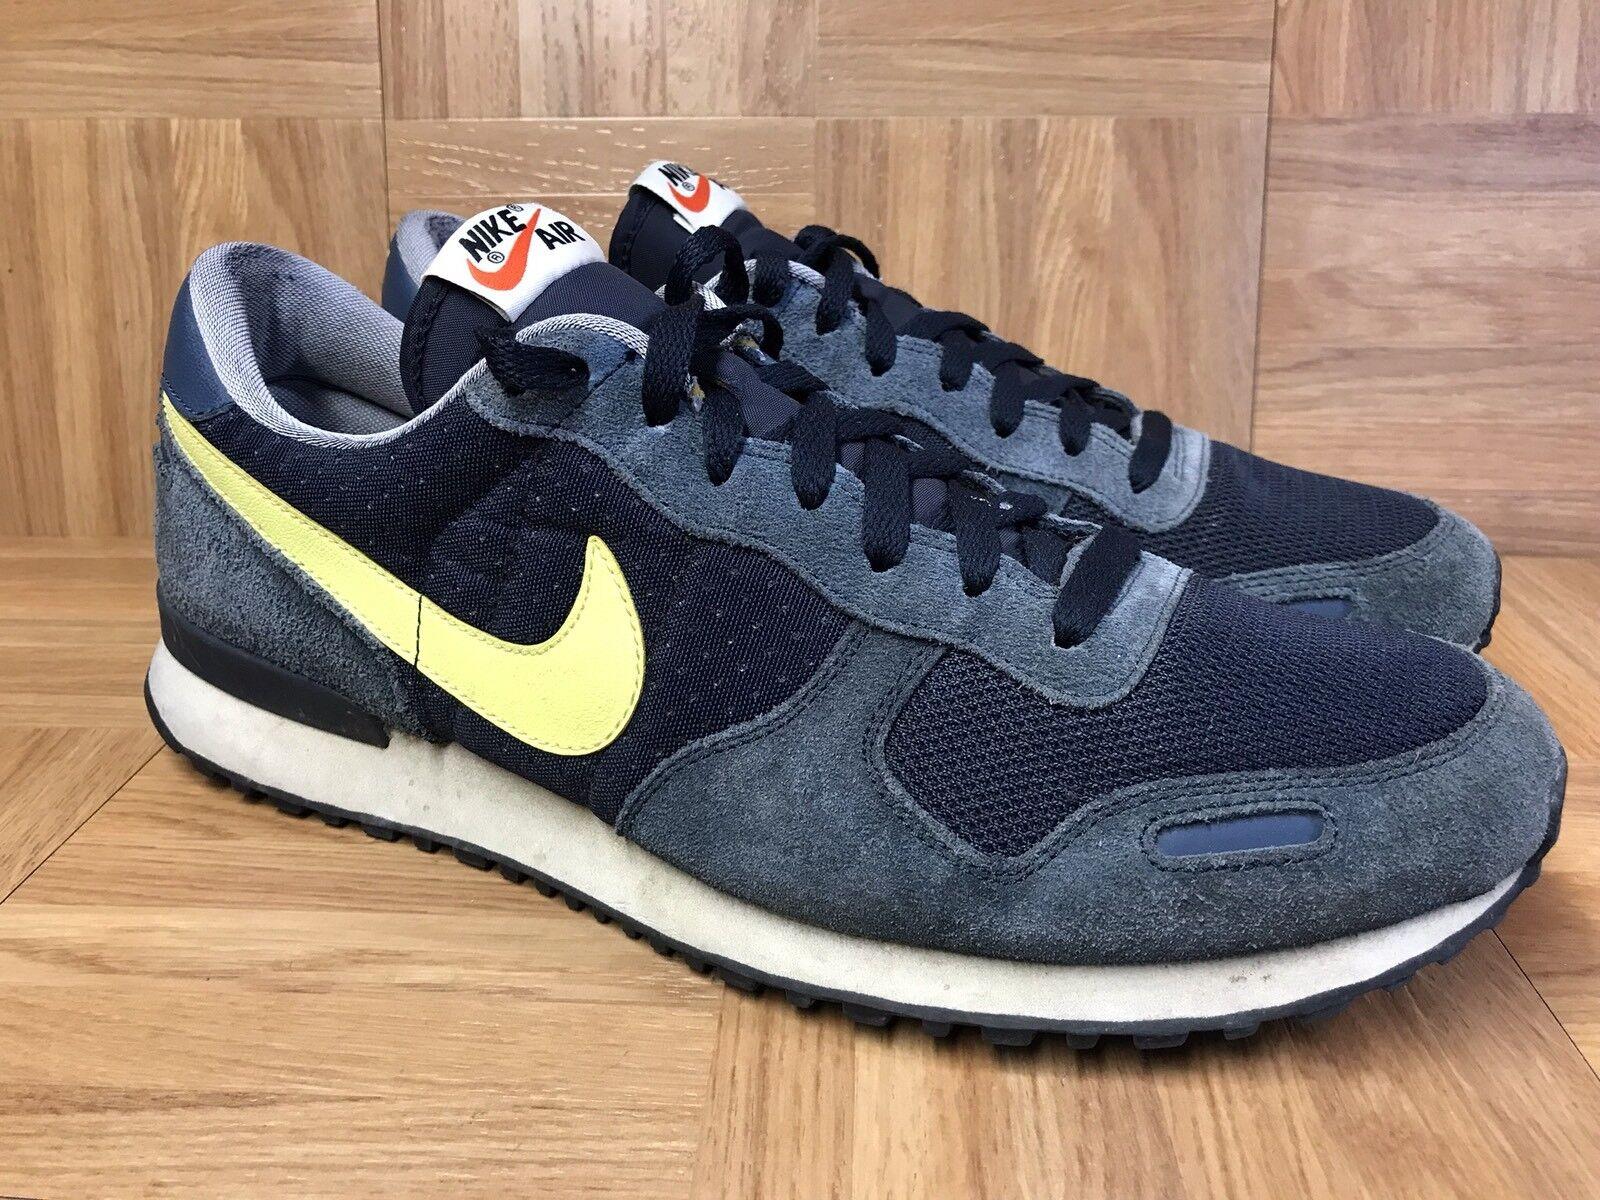 Vintage Nike Air Vortex Obsidian Yellow Men's shoes Sz 13 429773-474 Retro LE